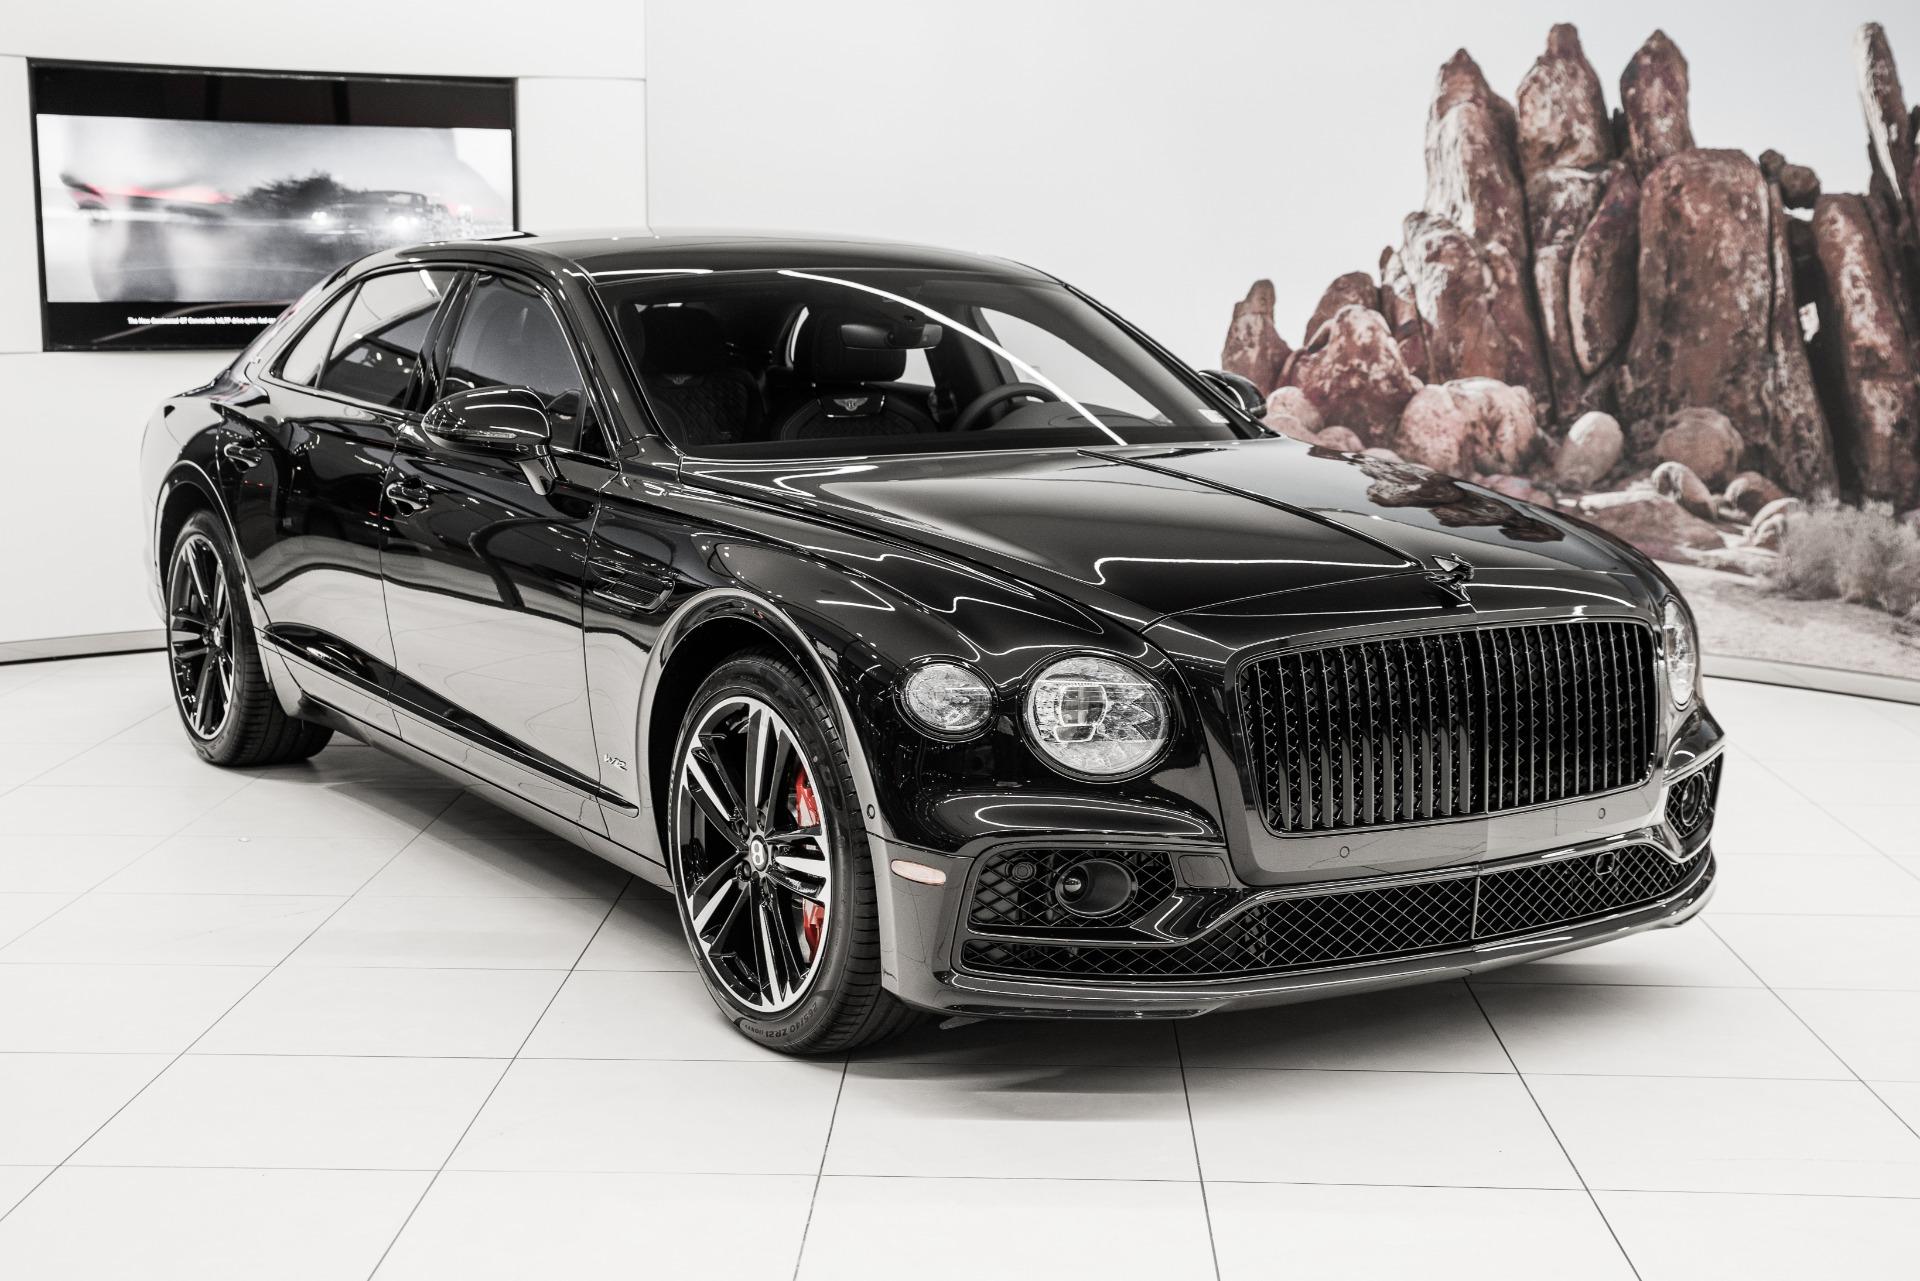 New-2021-Bentley-Flying-Spur-W12